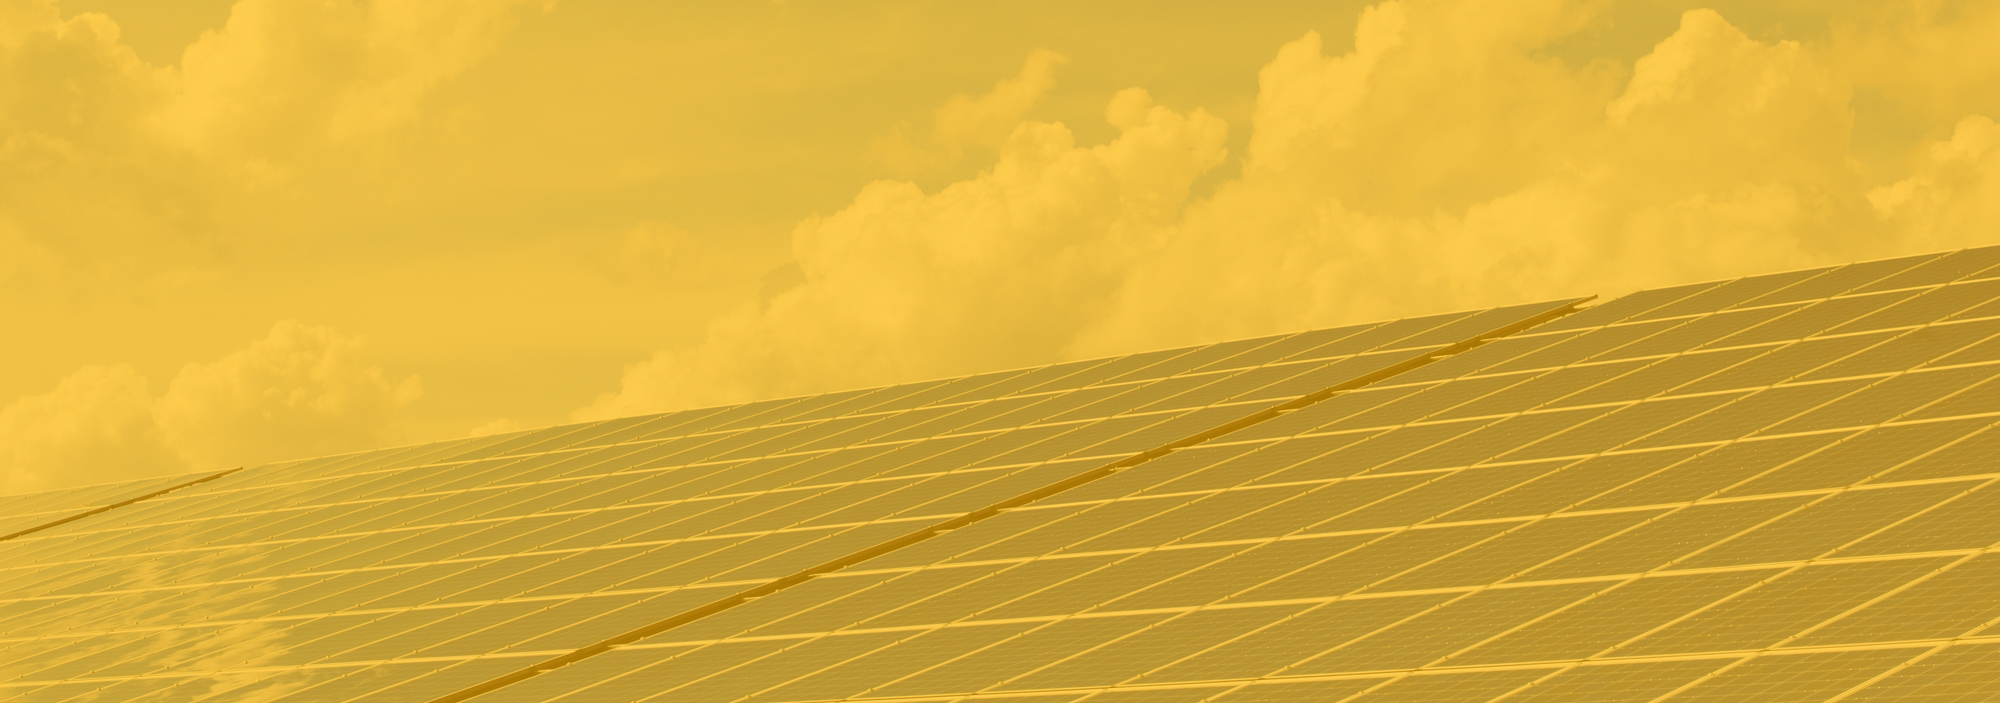 Zonnestroom Zakelijk - Veba Energieservice B.V.